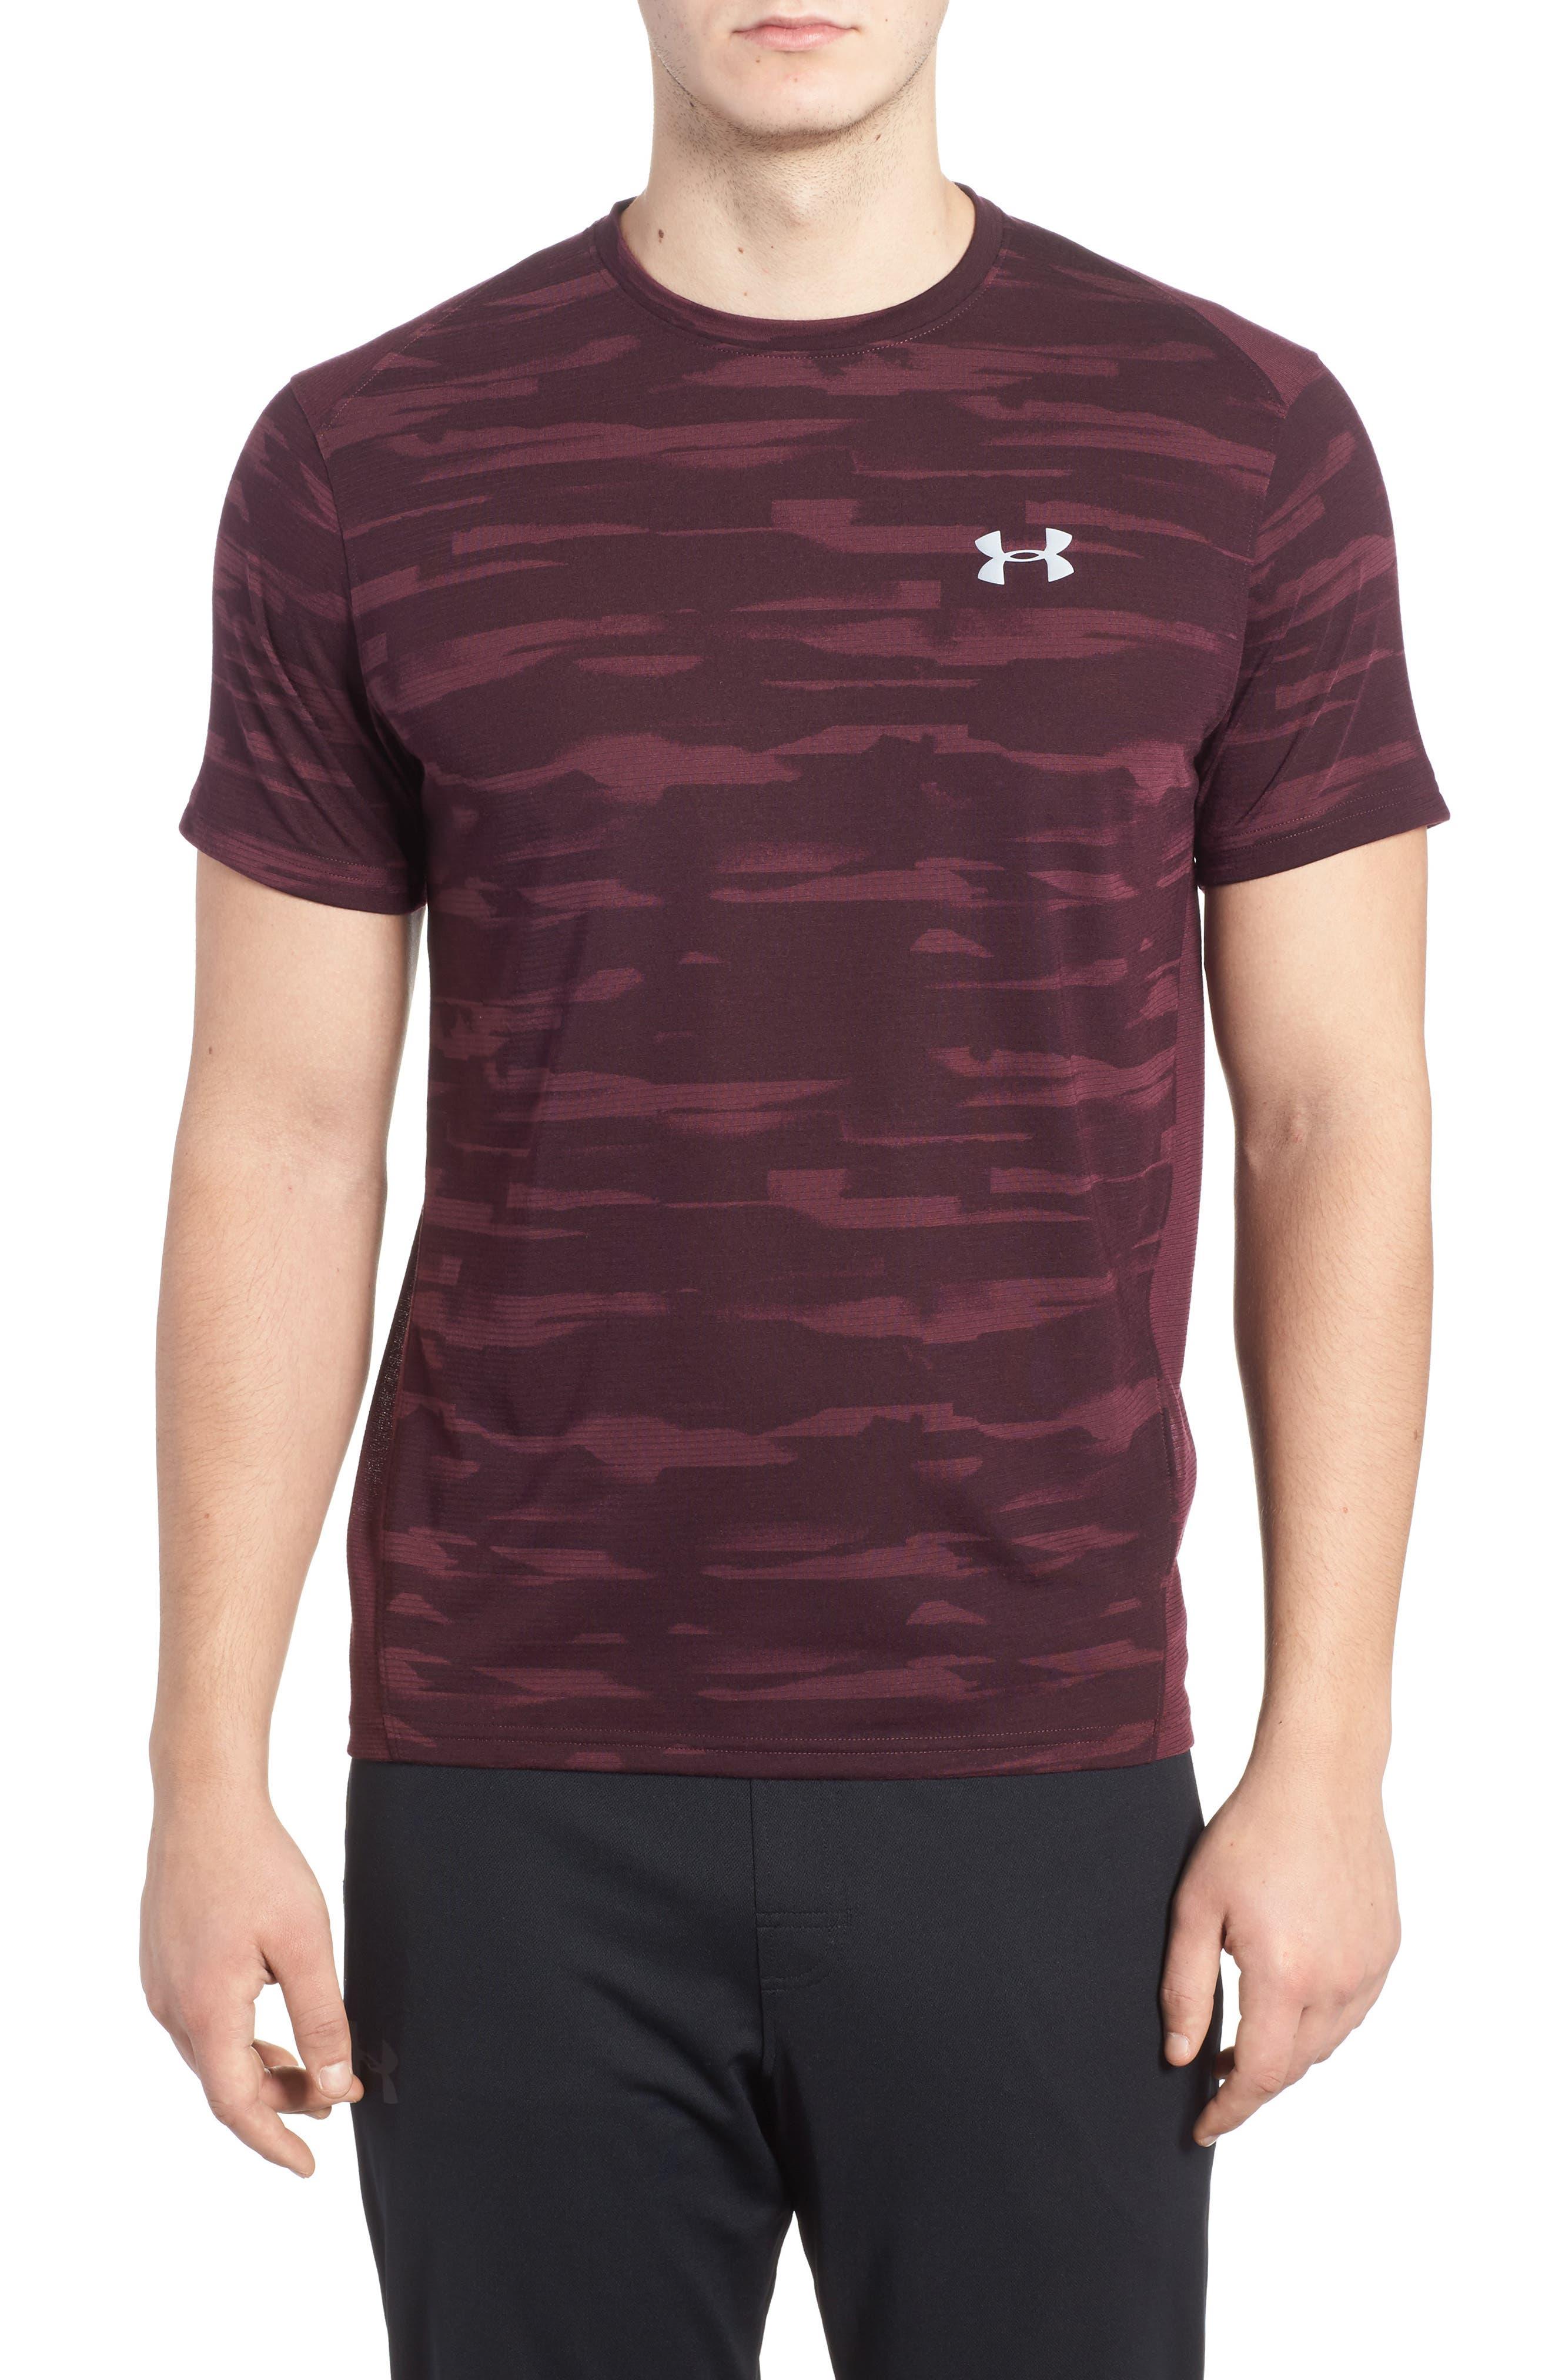 Alternate Image 1 Selected - Under Armour Threadborne Mesh Running T-Shirt